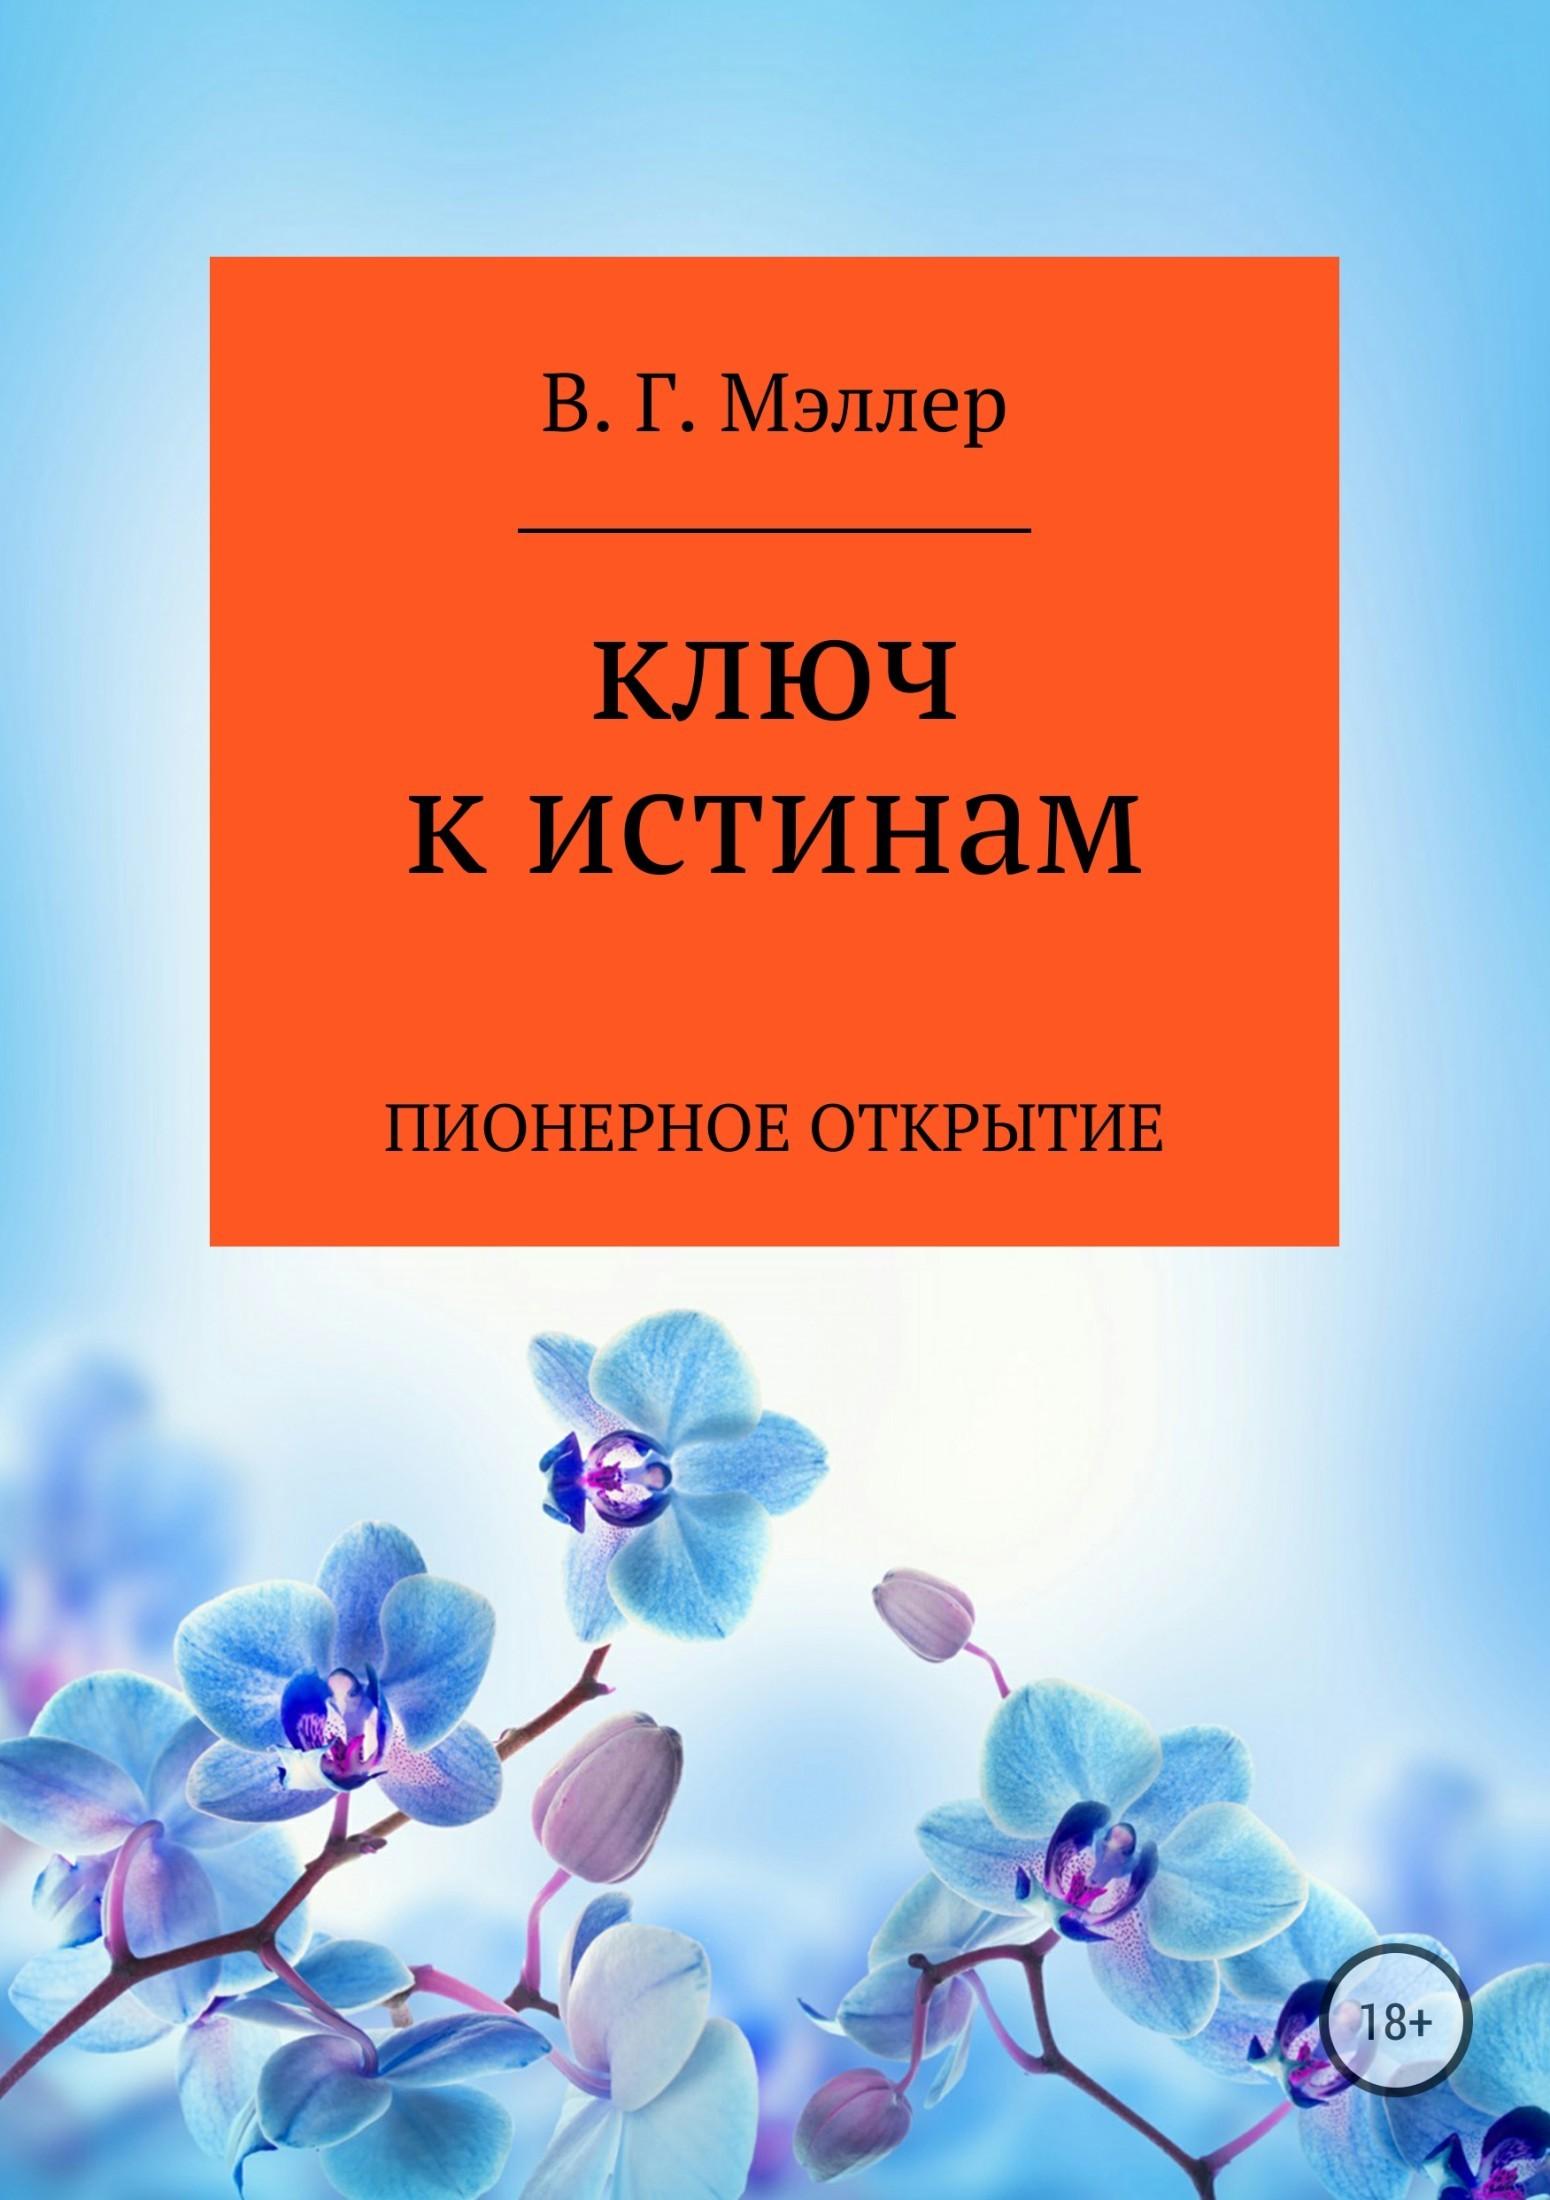 ВИКТОР ГРИГОРЬЕВИЧ МЭЛЛЕР Ключ к истинам виктор григорьевич мэллер и любовь и счастье